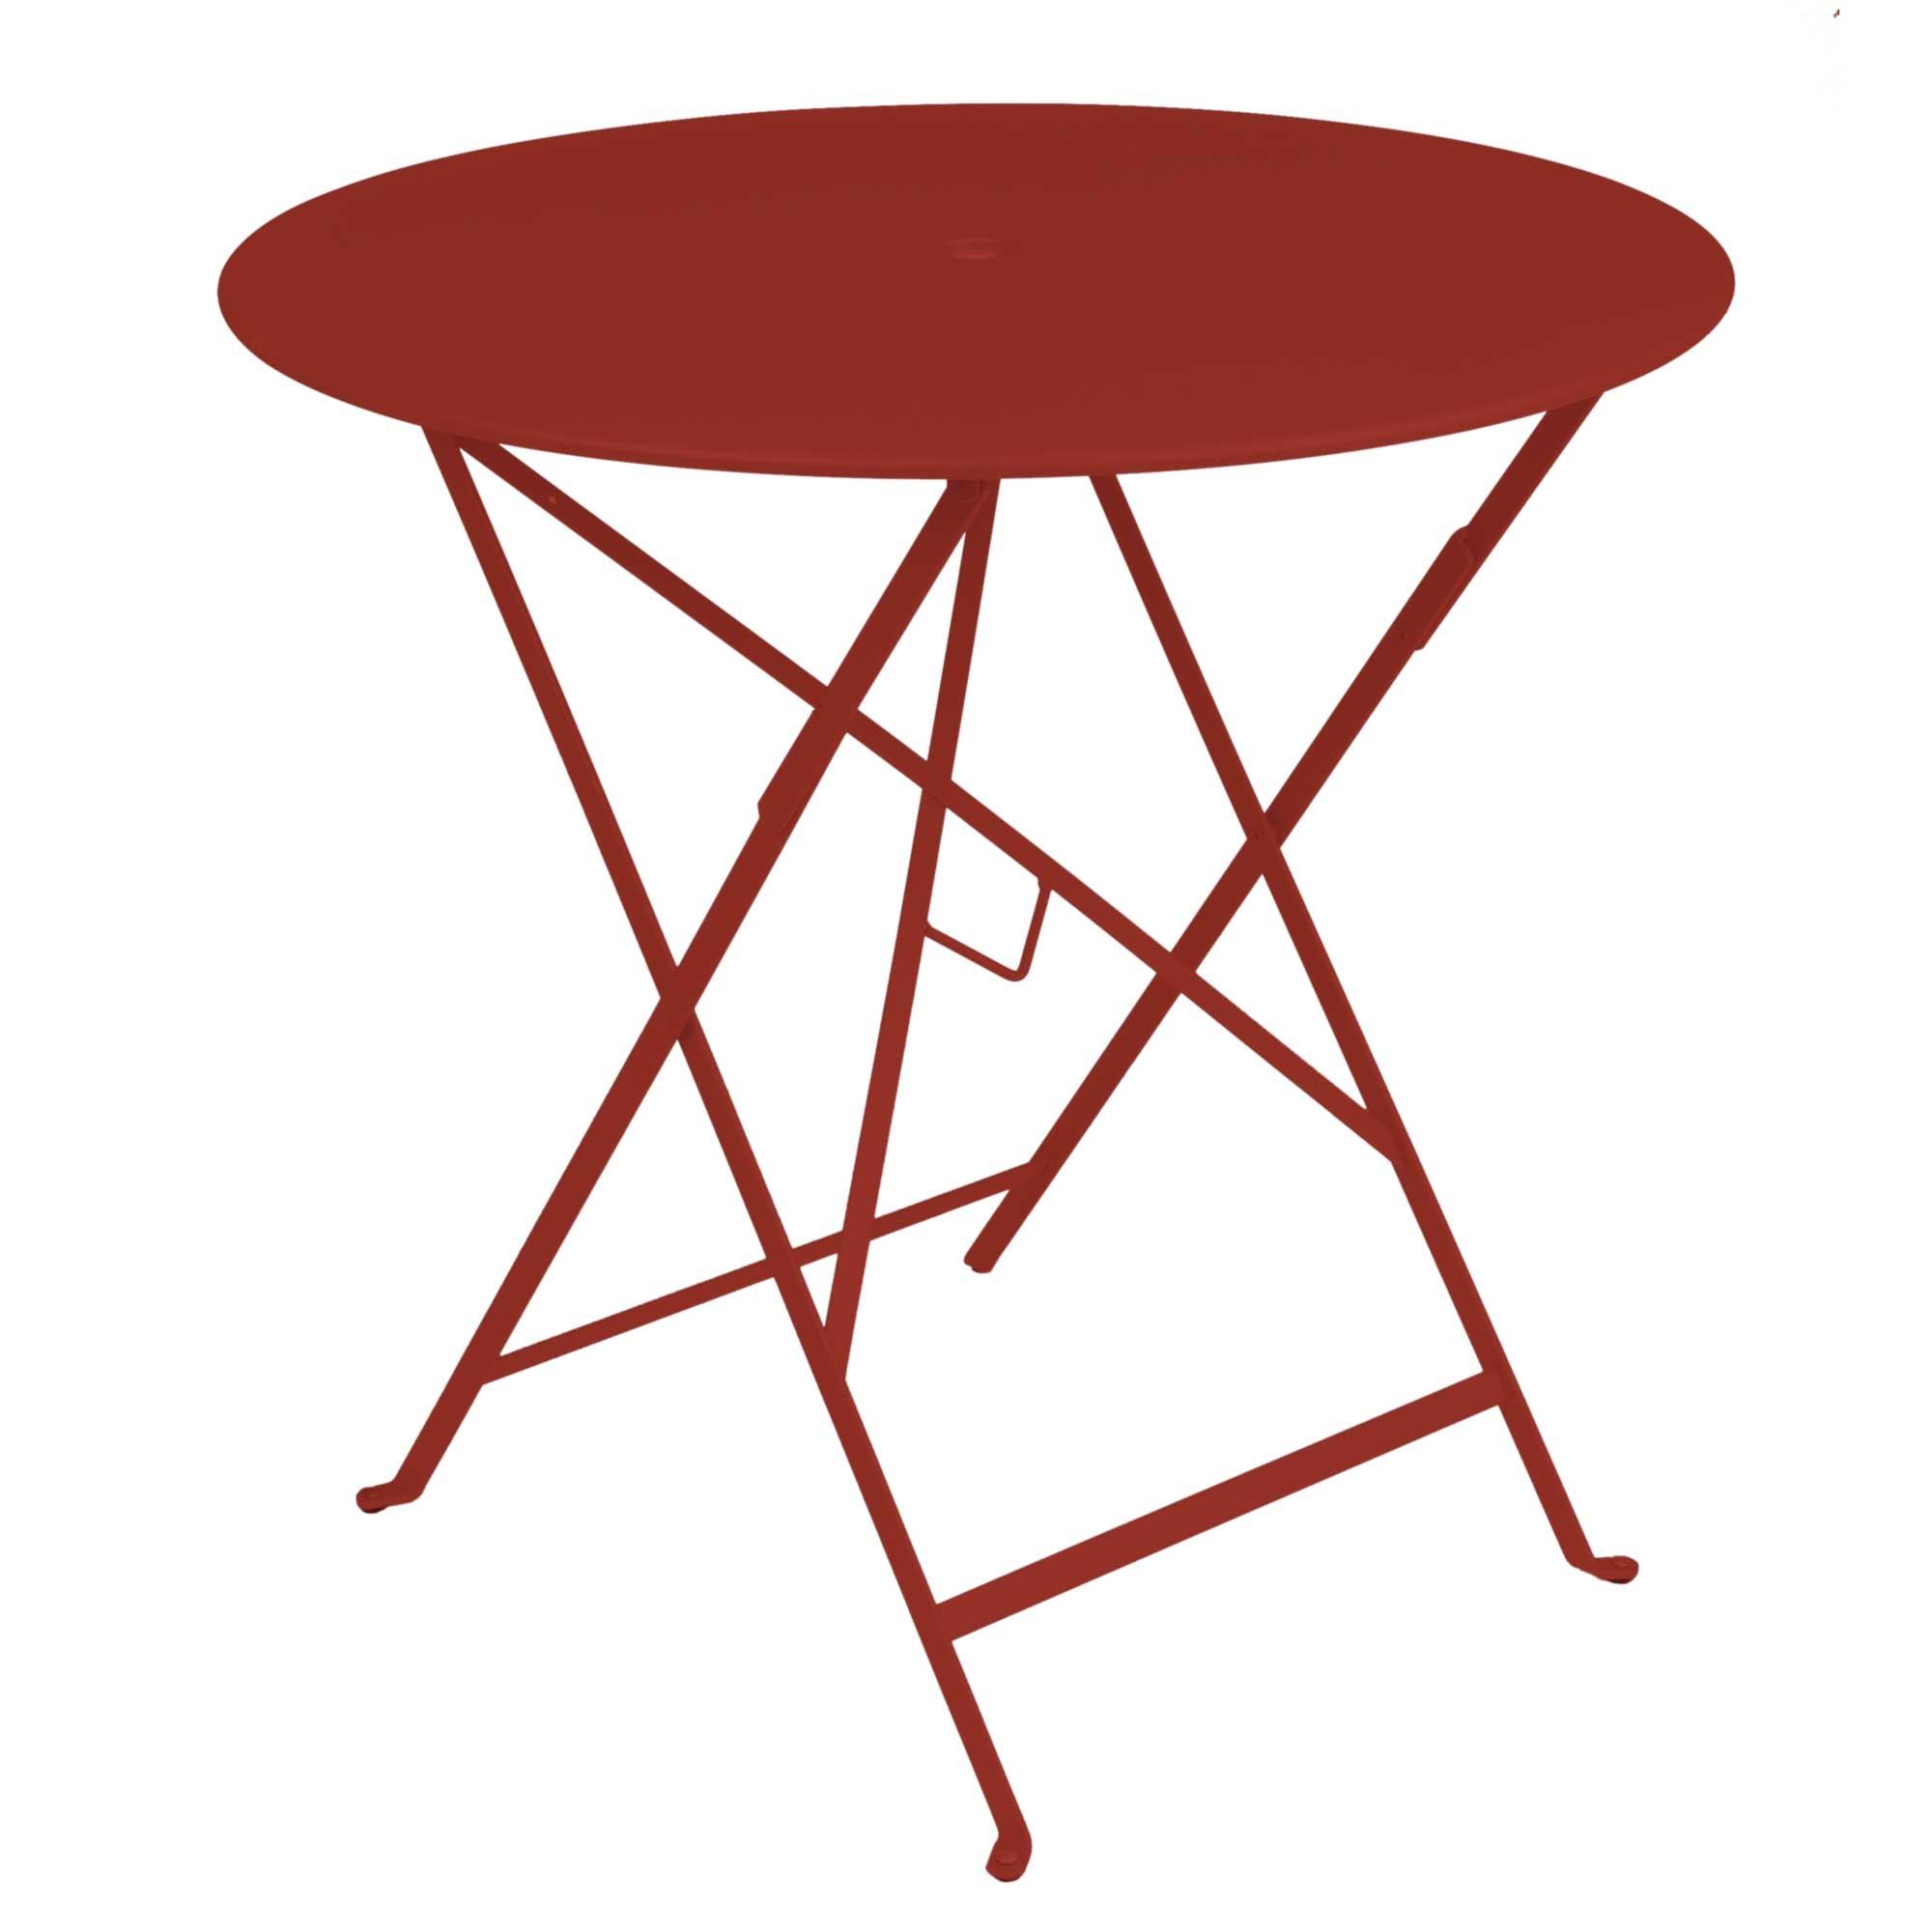 fermob table ronde pliante bistro de fermob x cm piment. Black Bedroom Furniture Sets. Home Design Ideas